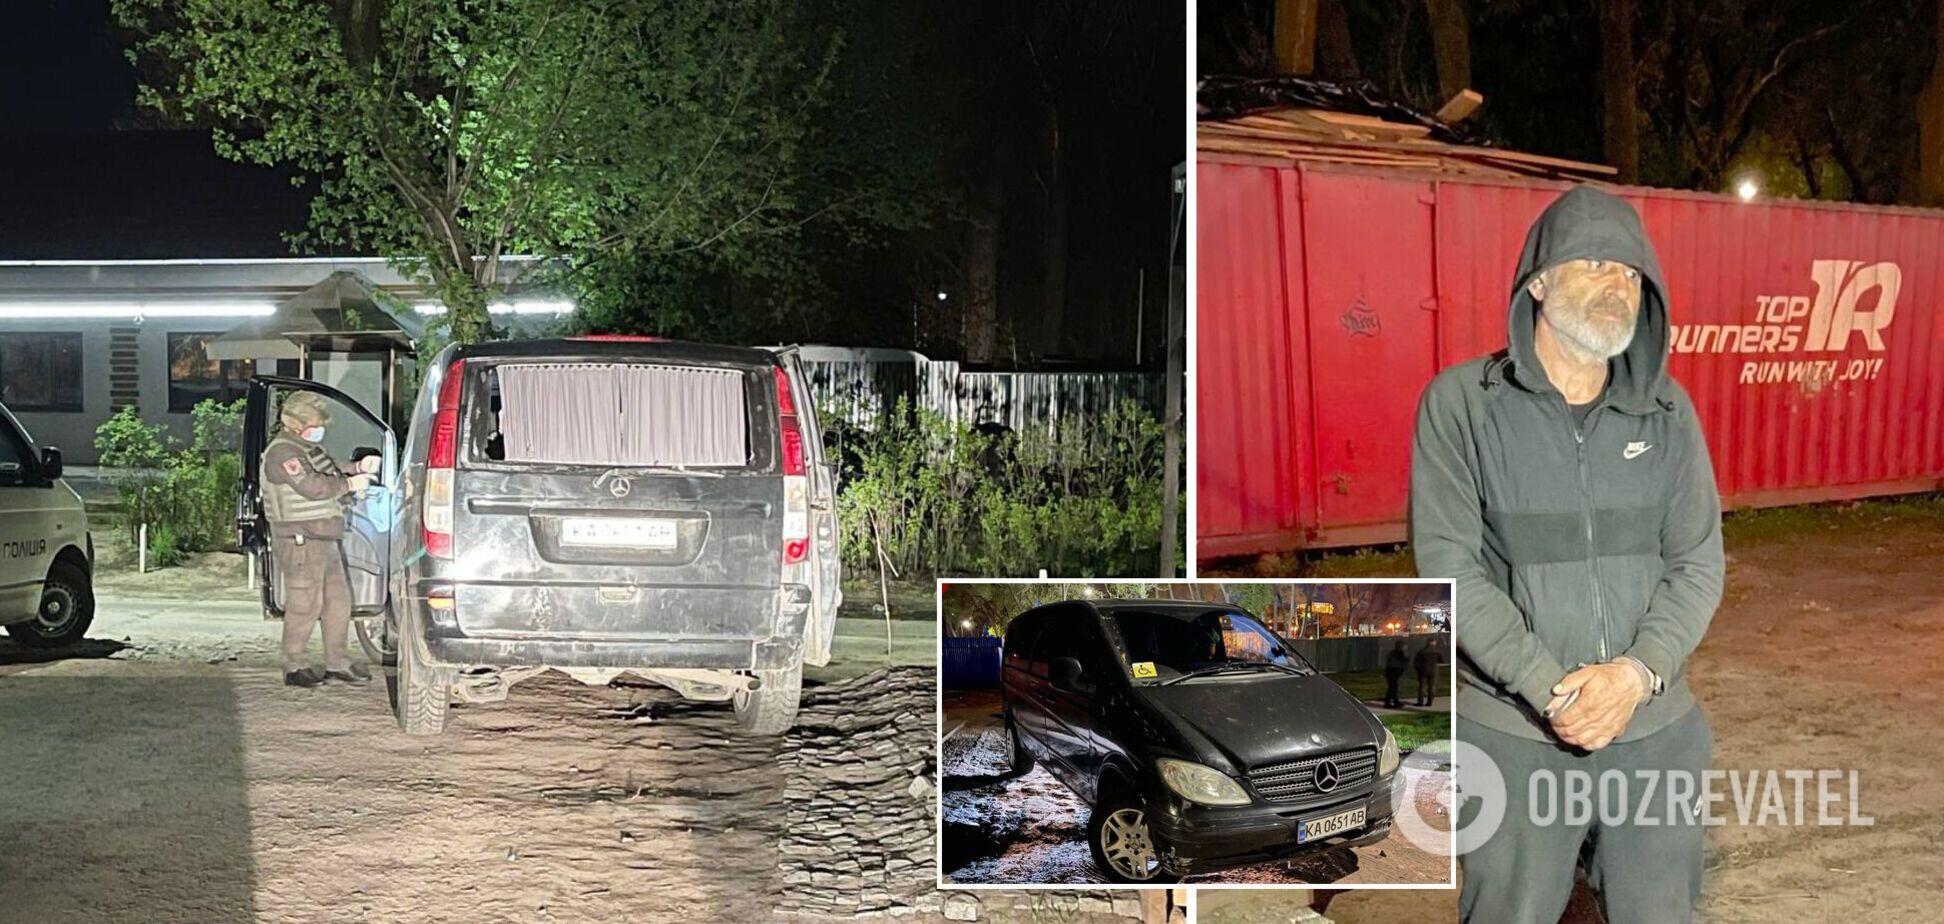 В Киеве задержали нетрезвого водителя без прав с гранатой в авто. Фото